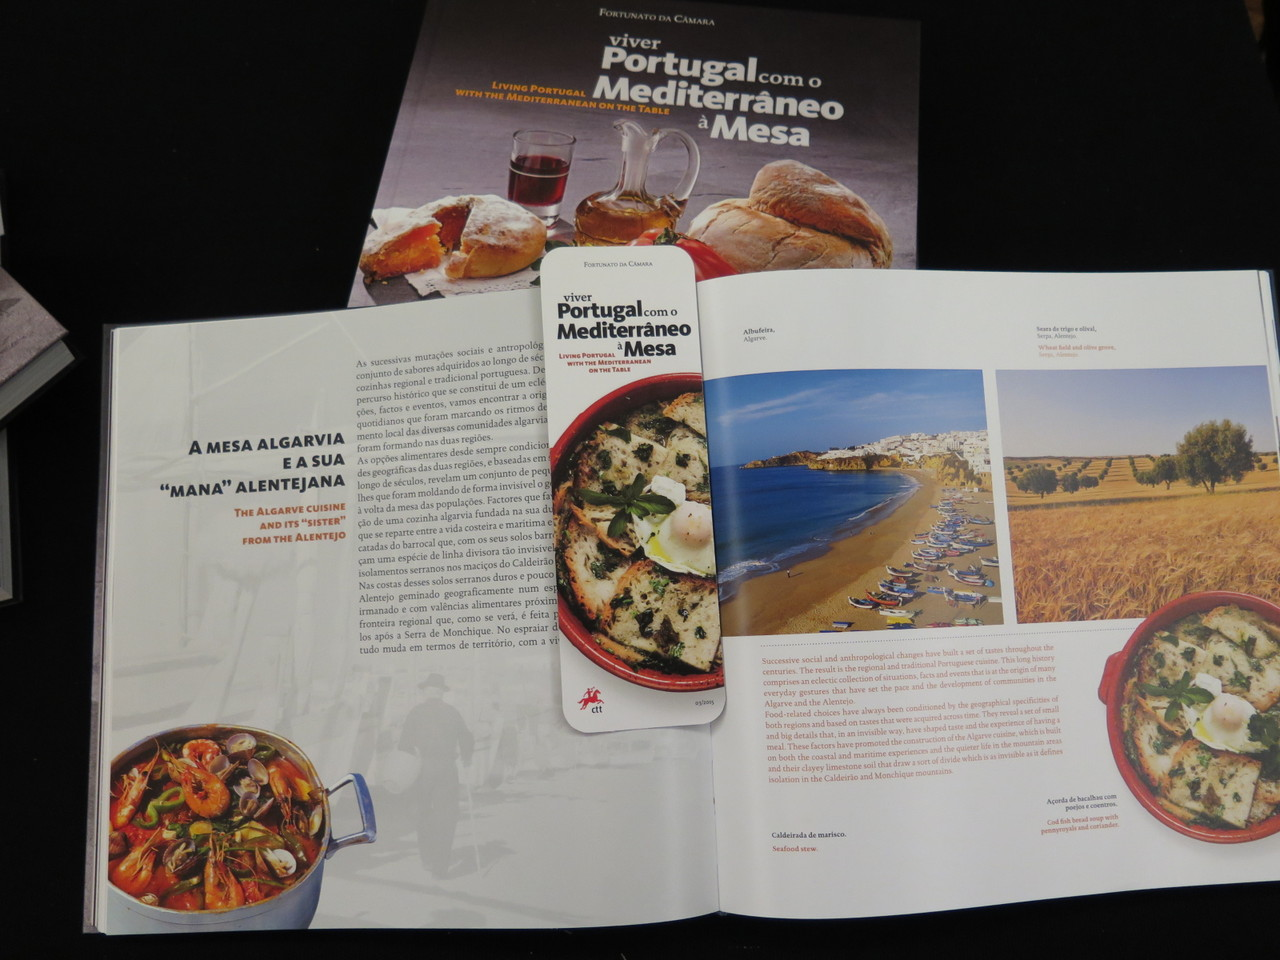 Fortunato da Câmara e a dieta mediterrânica na gastronomia portuguesa